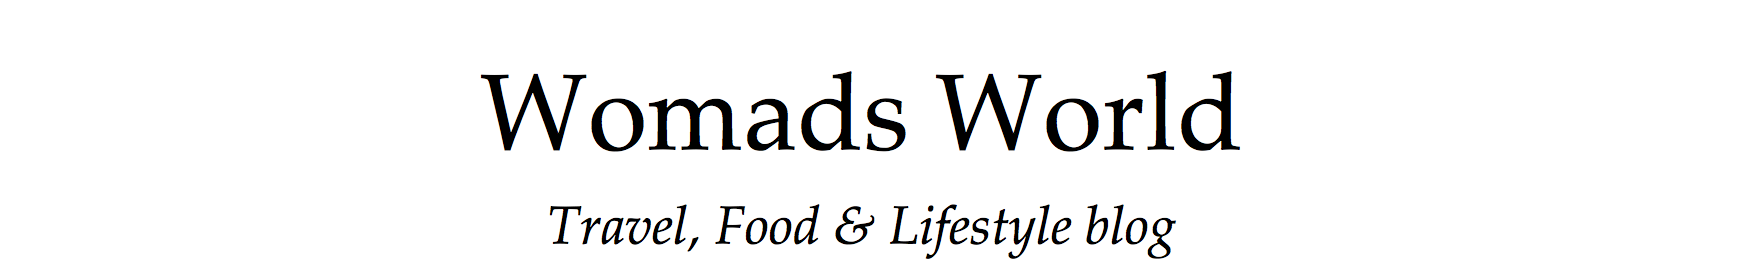 WomadsWorld